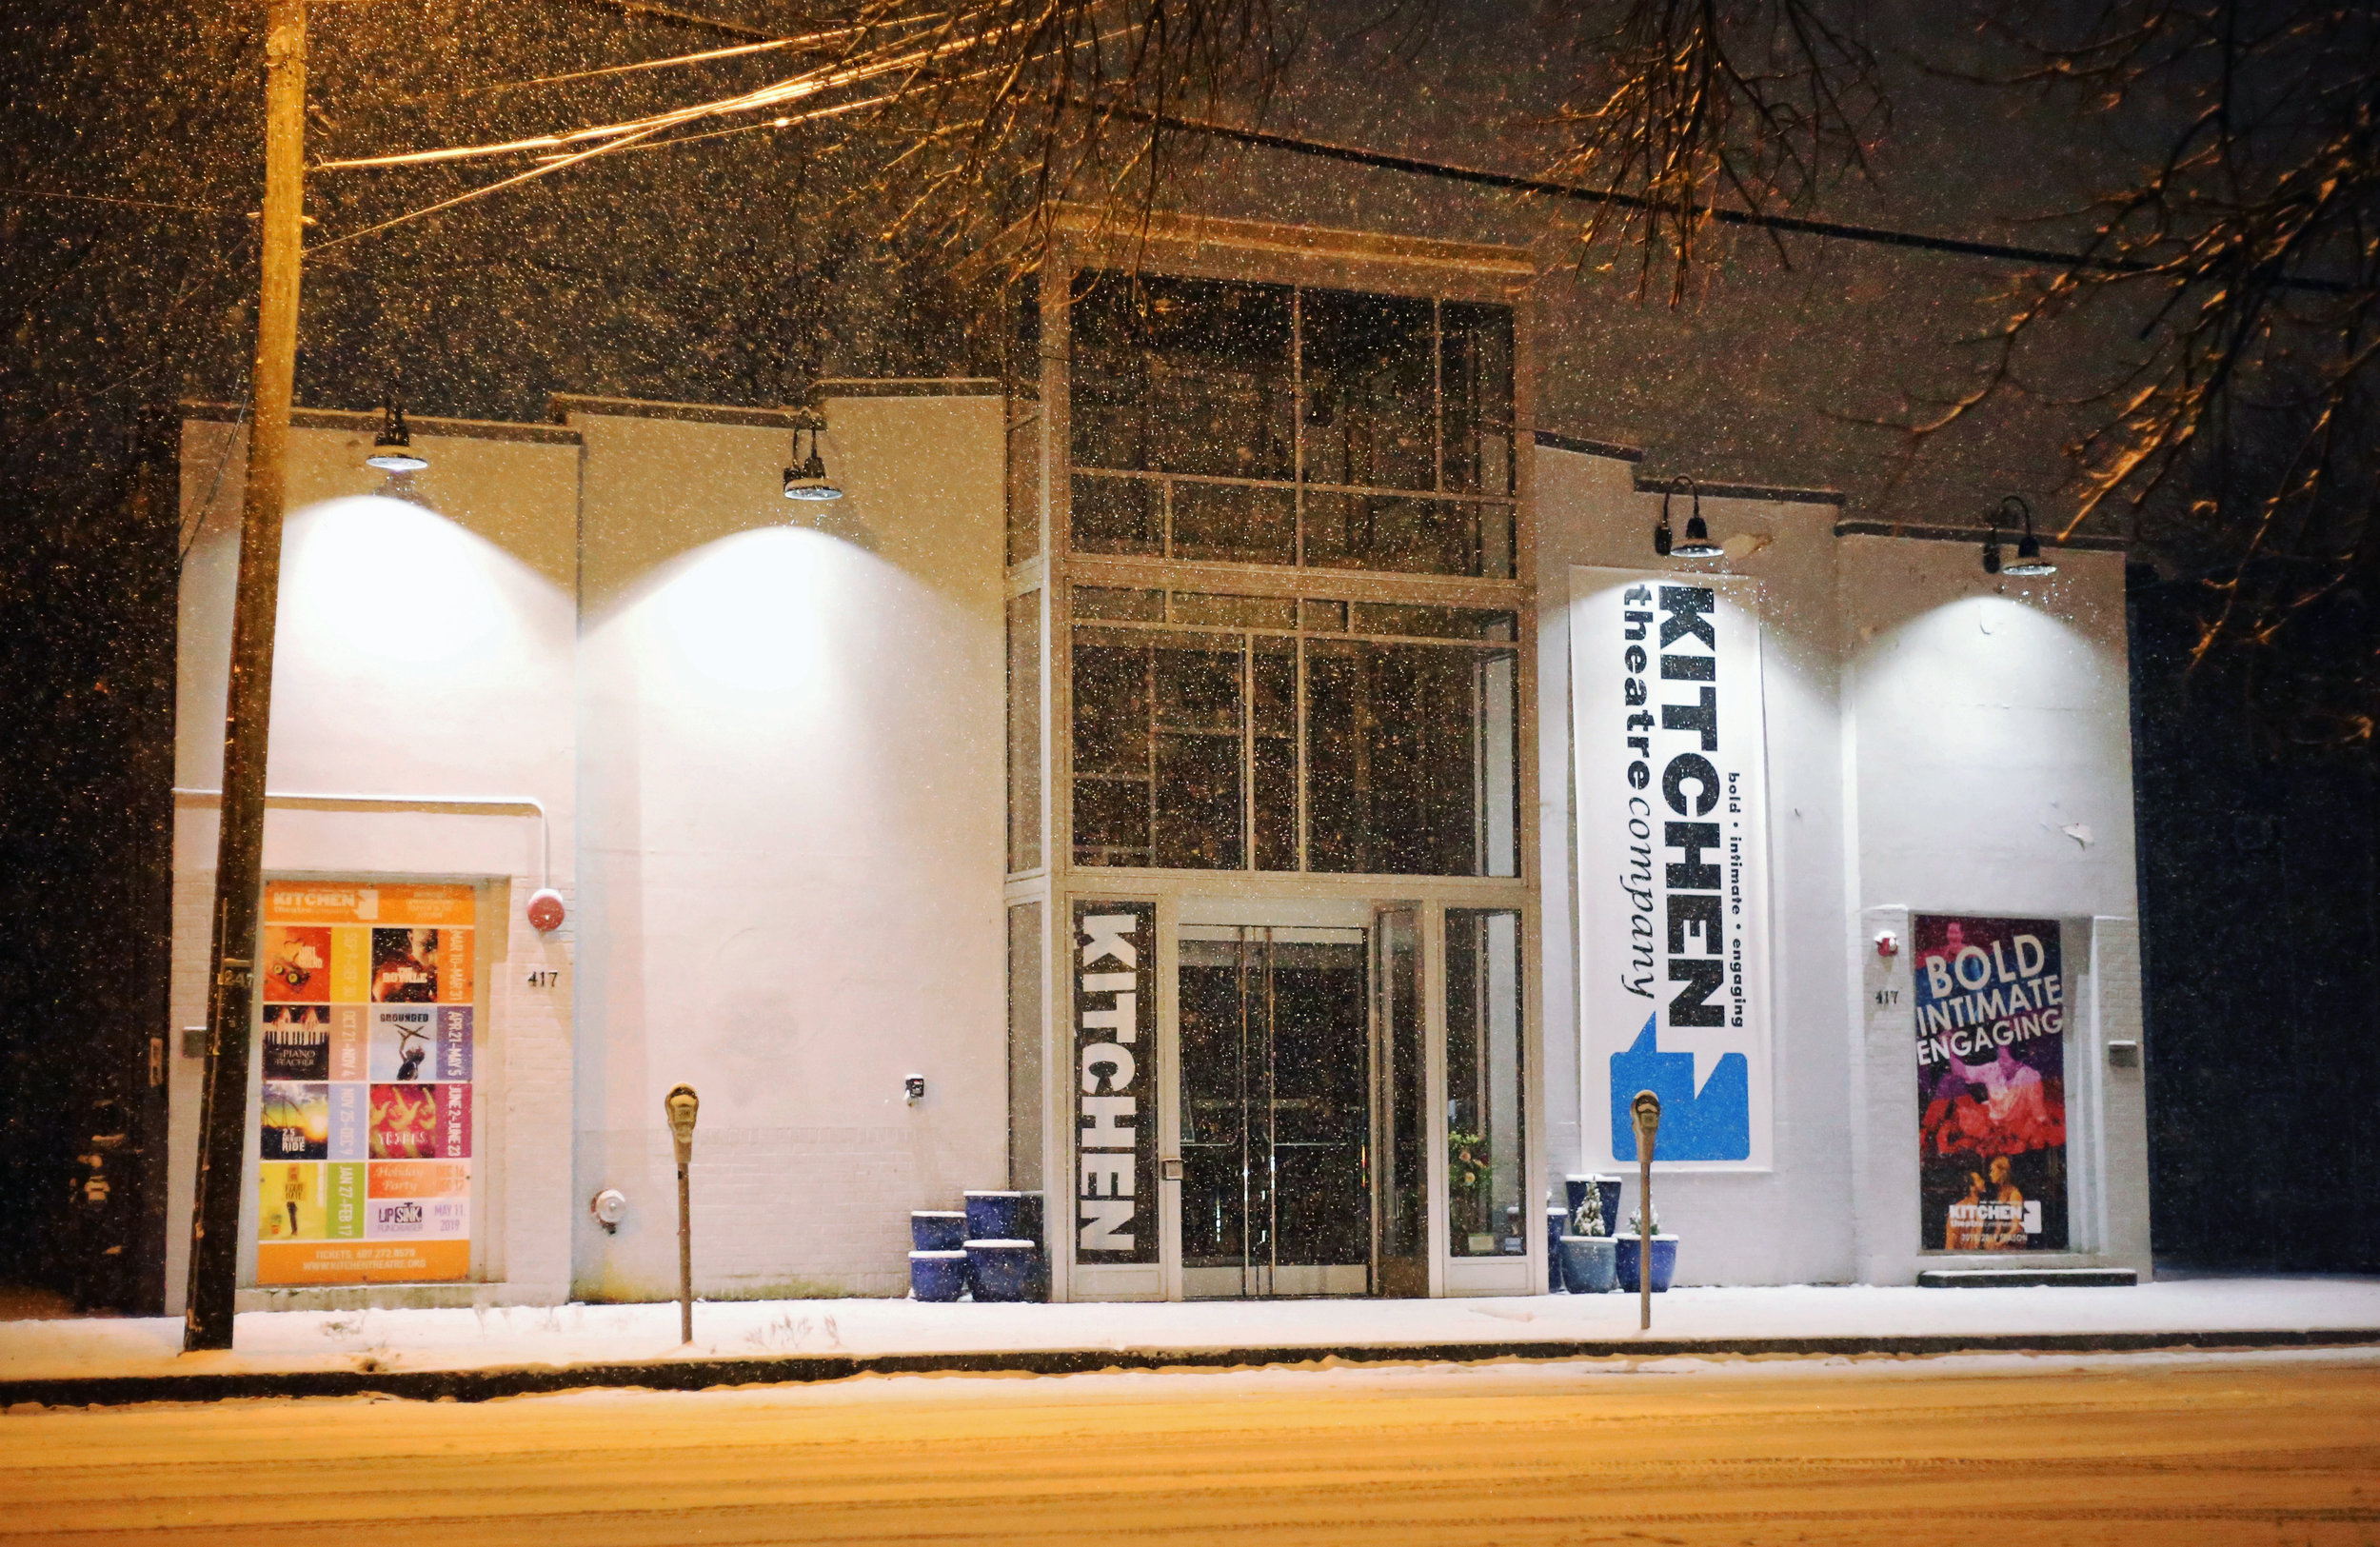 Kitchen Theatre Company, Image 2, Kristine Vann.jpg